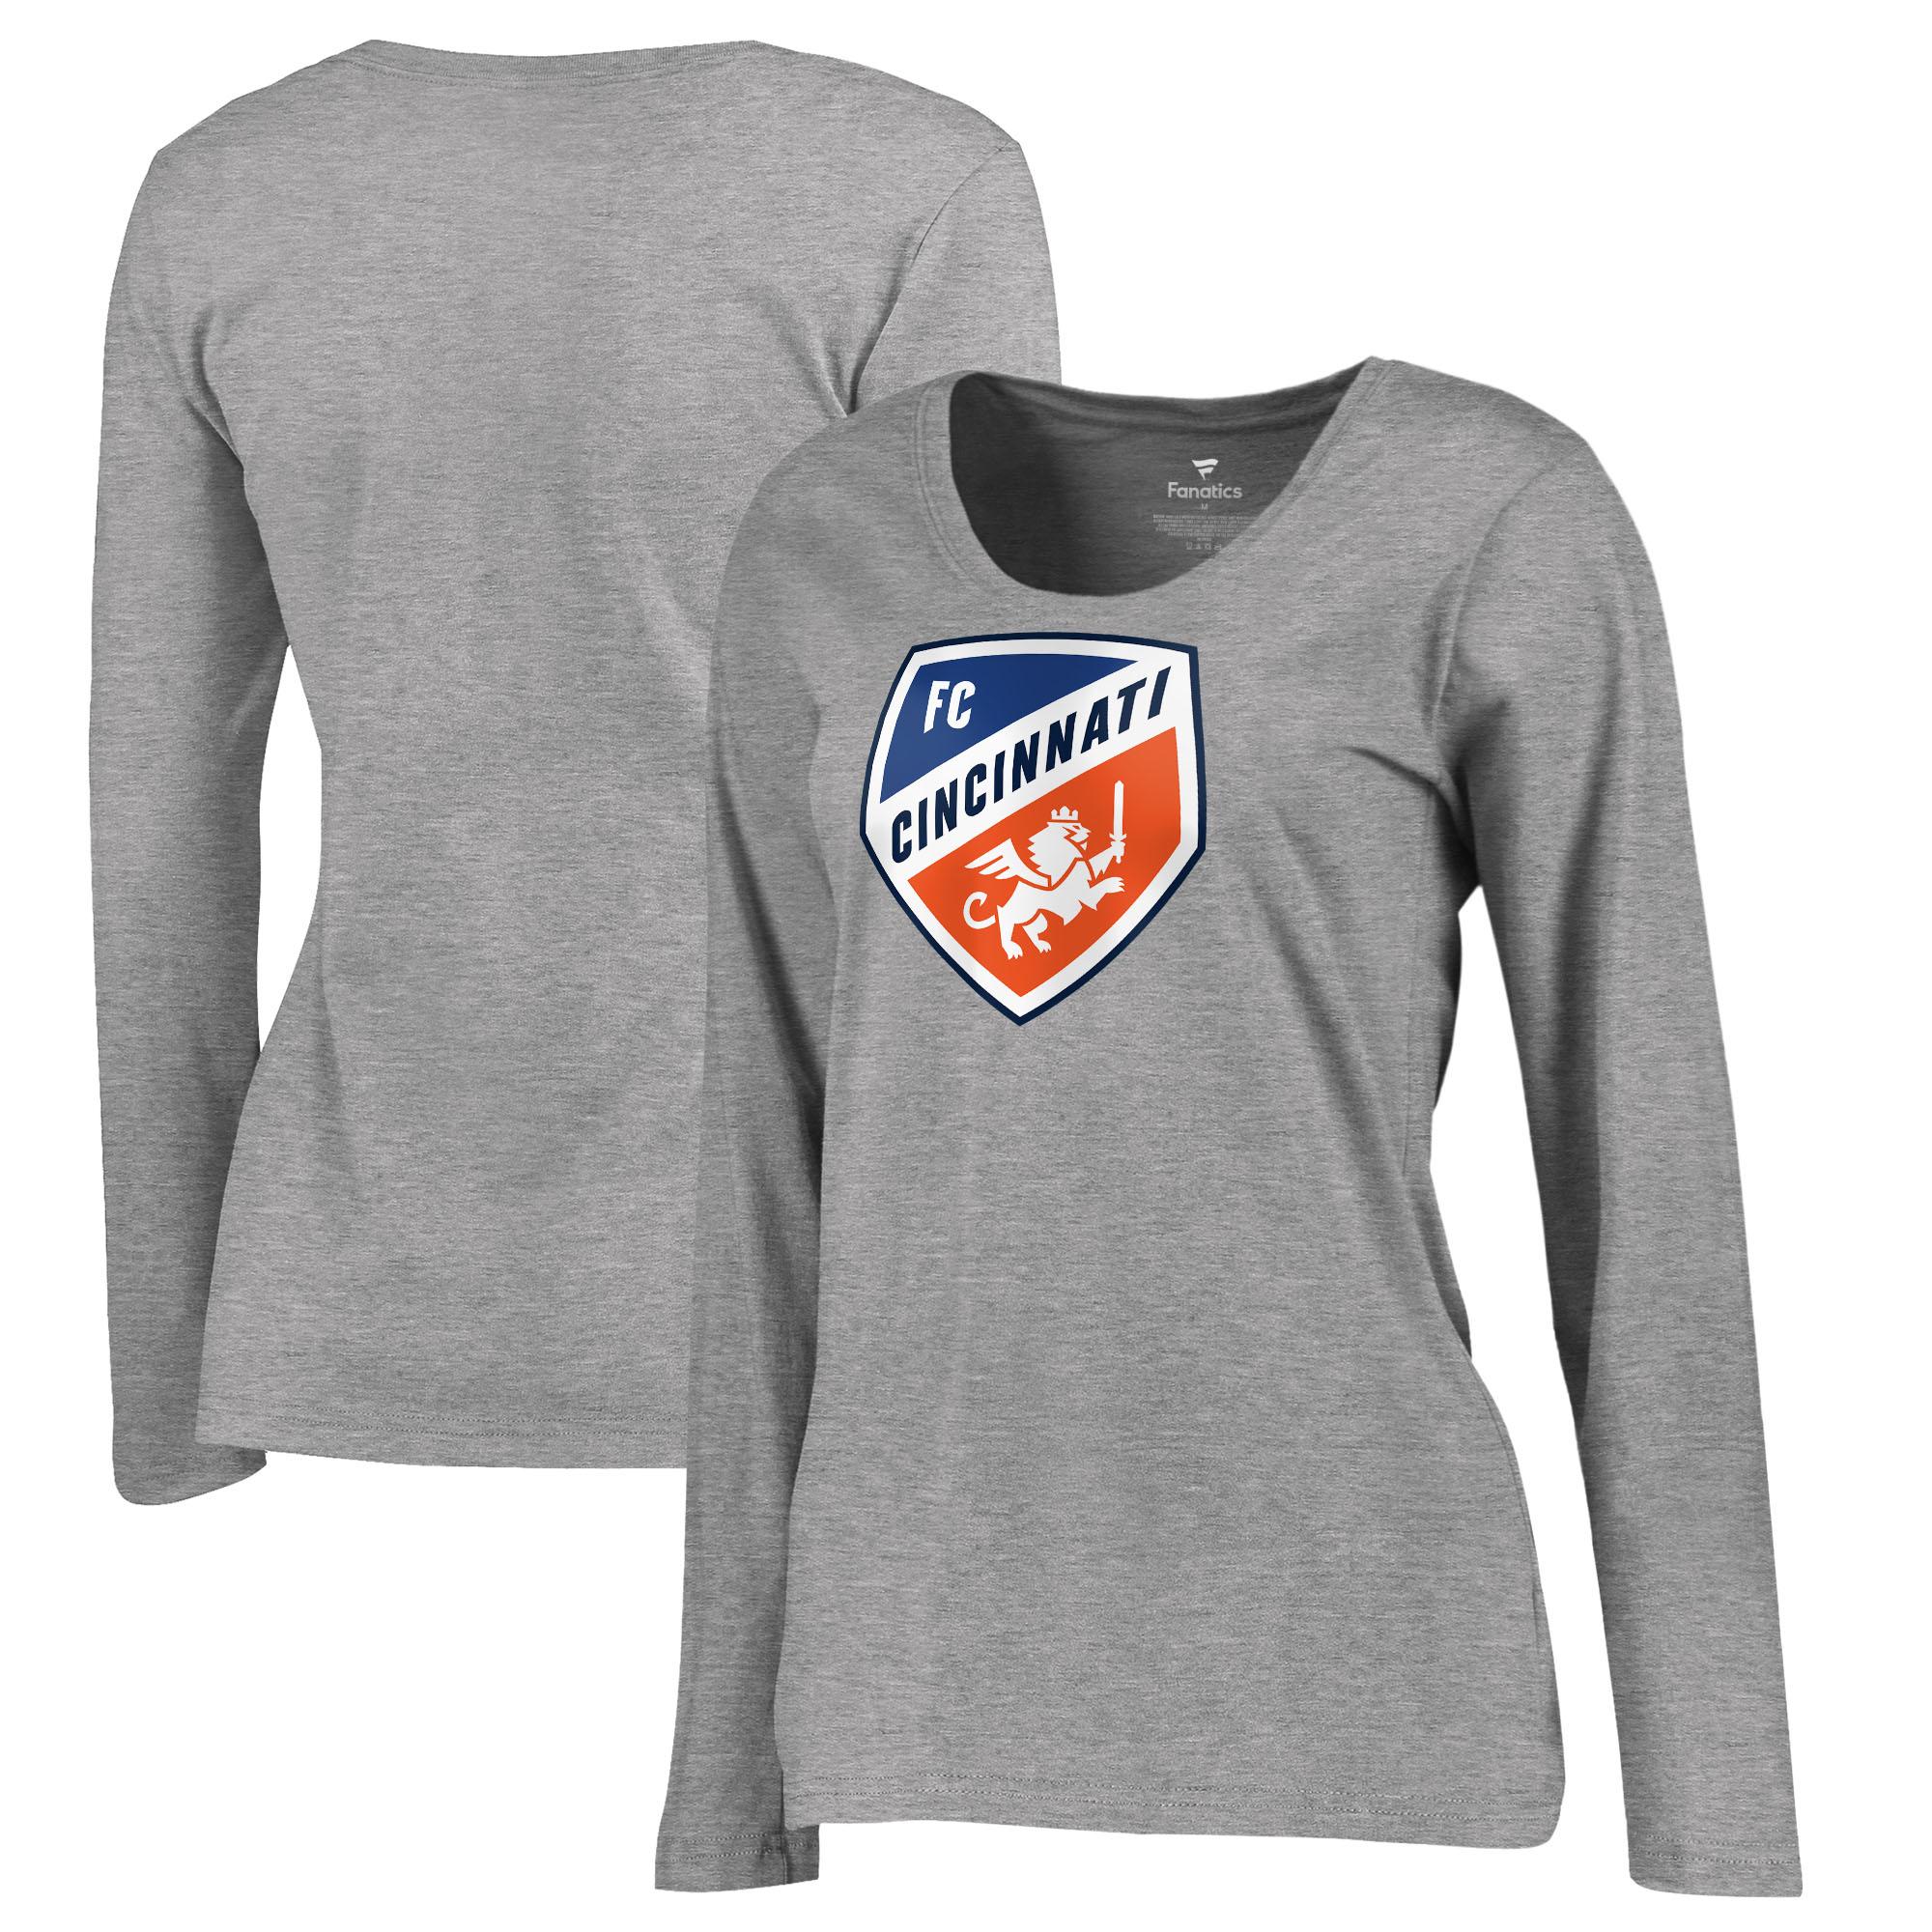 FC Cincinnati Fanatics Branded Women's Primary Logo Plus Size Long Sleeve V-Neck T-Shirt - Heather Gray